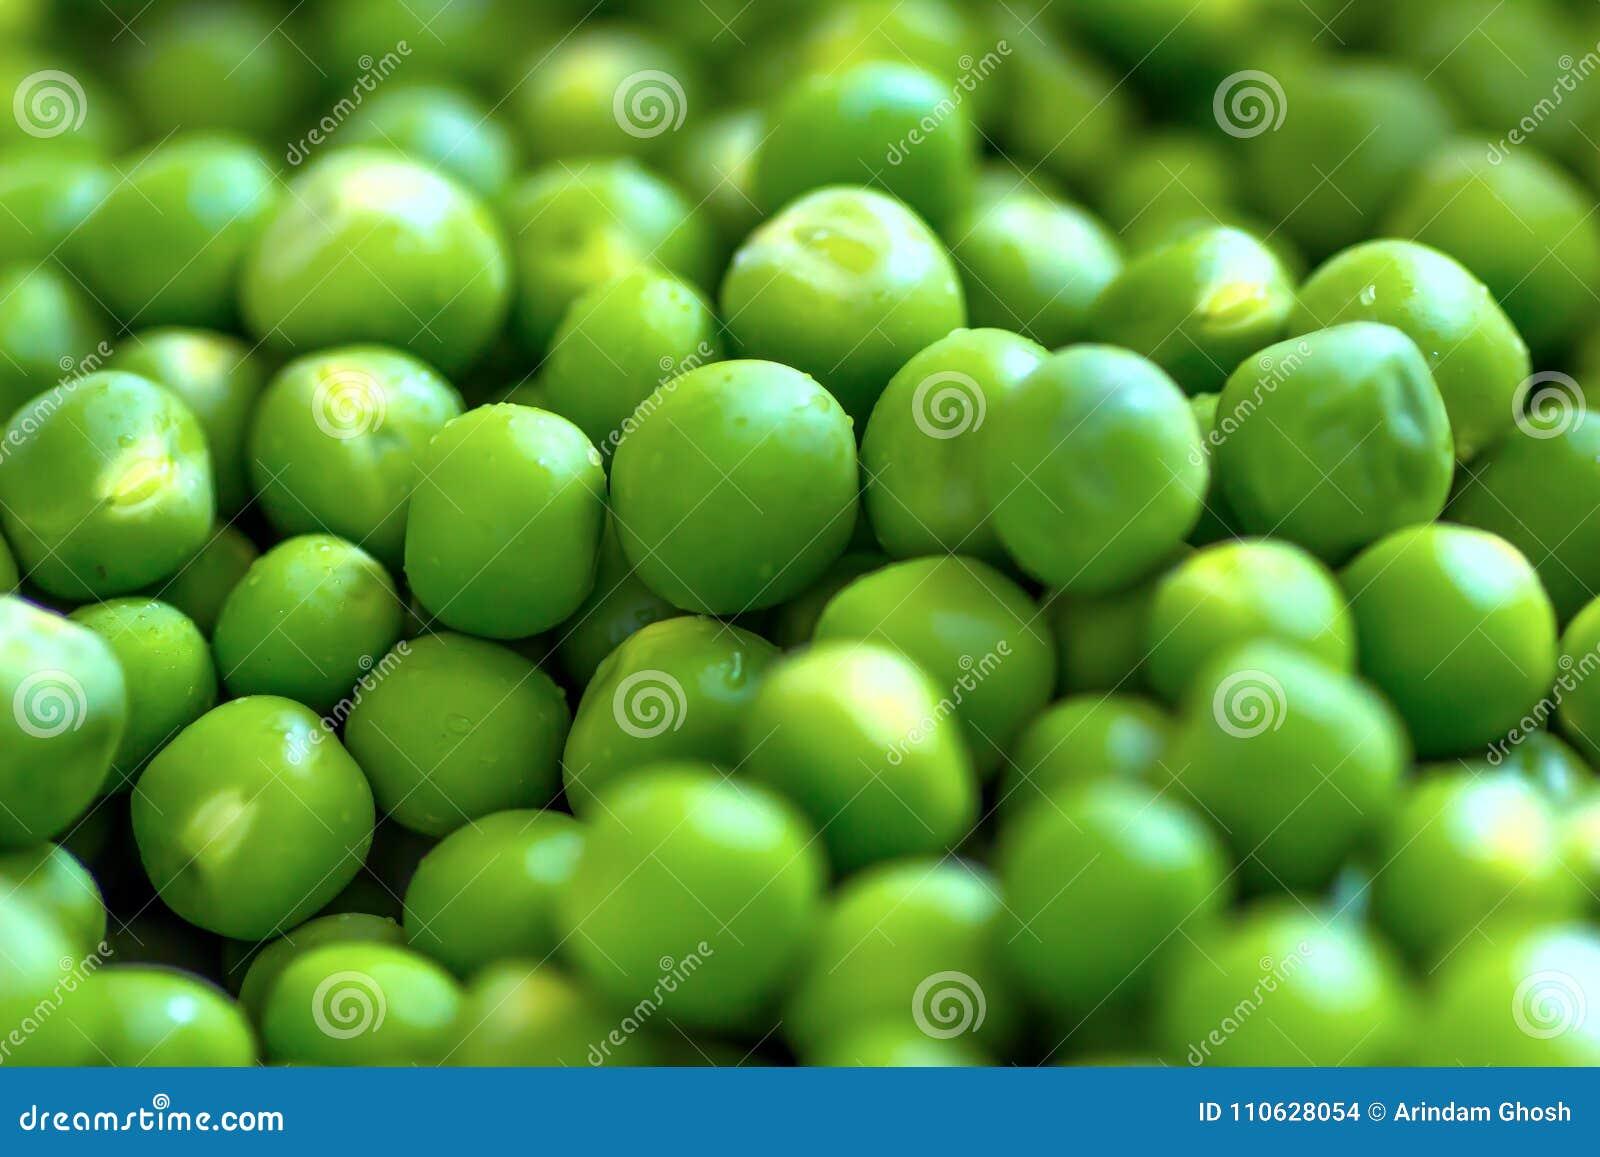 Grânulos da ervilha verde